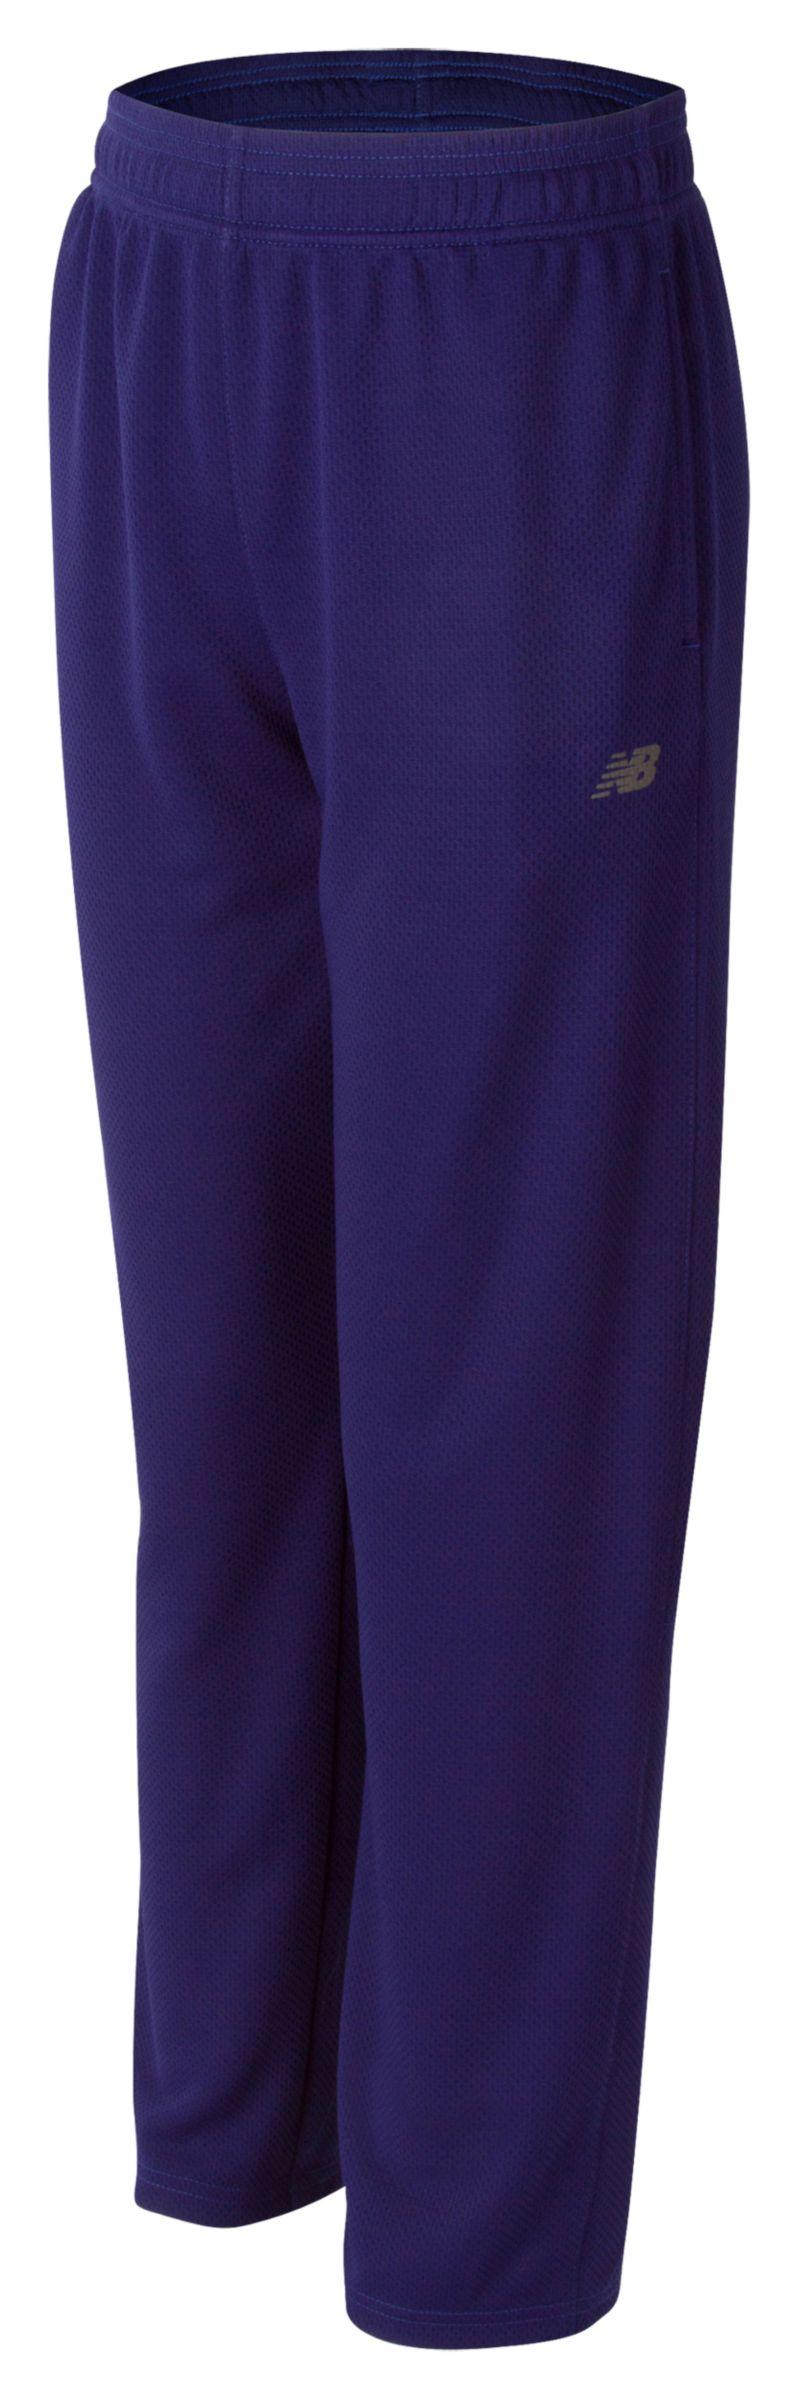 New Balance Boys Athletic Pant Blue